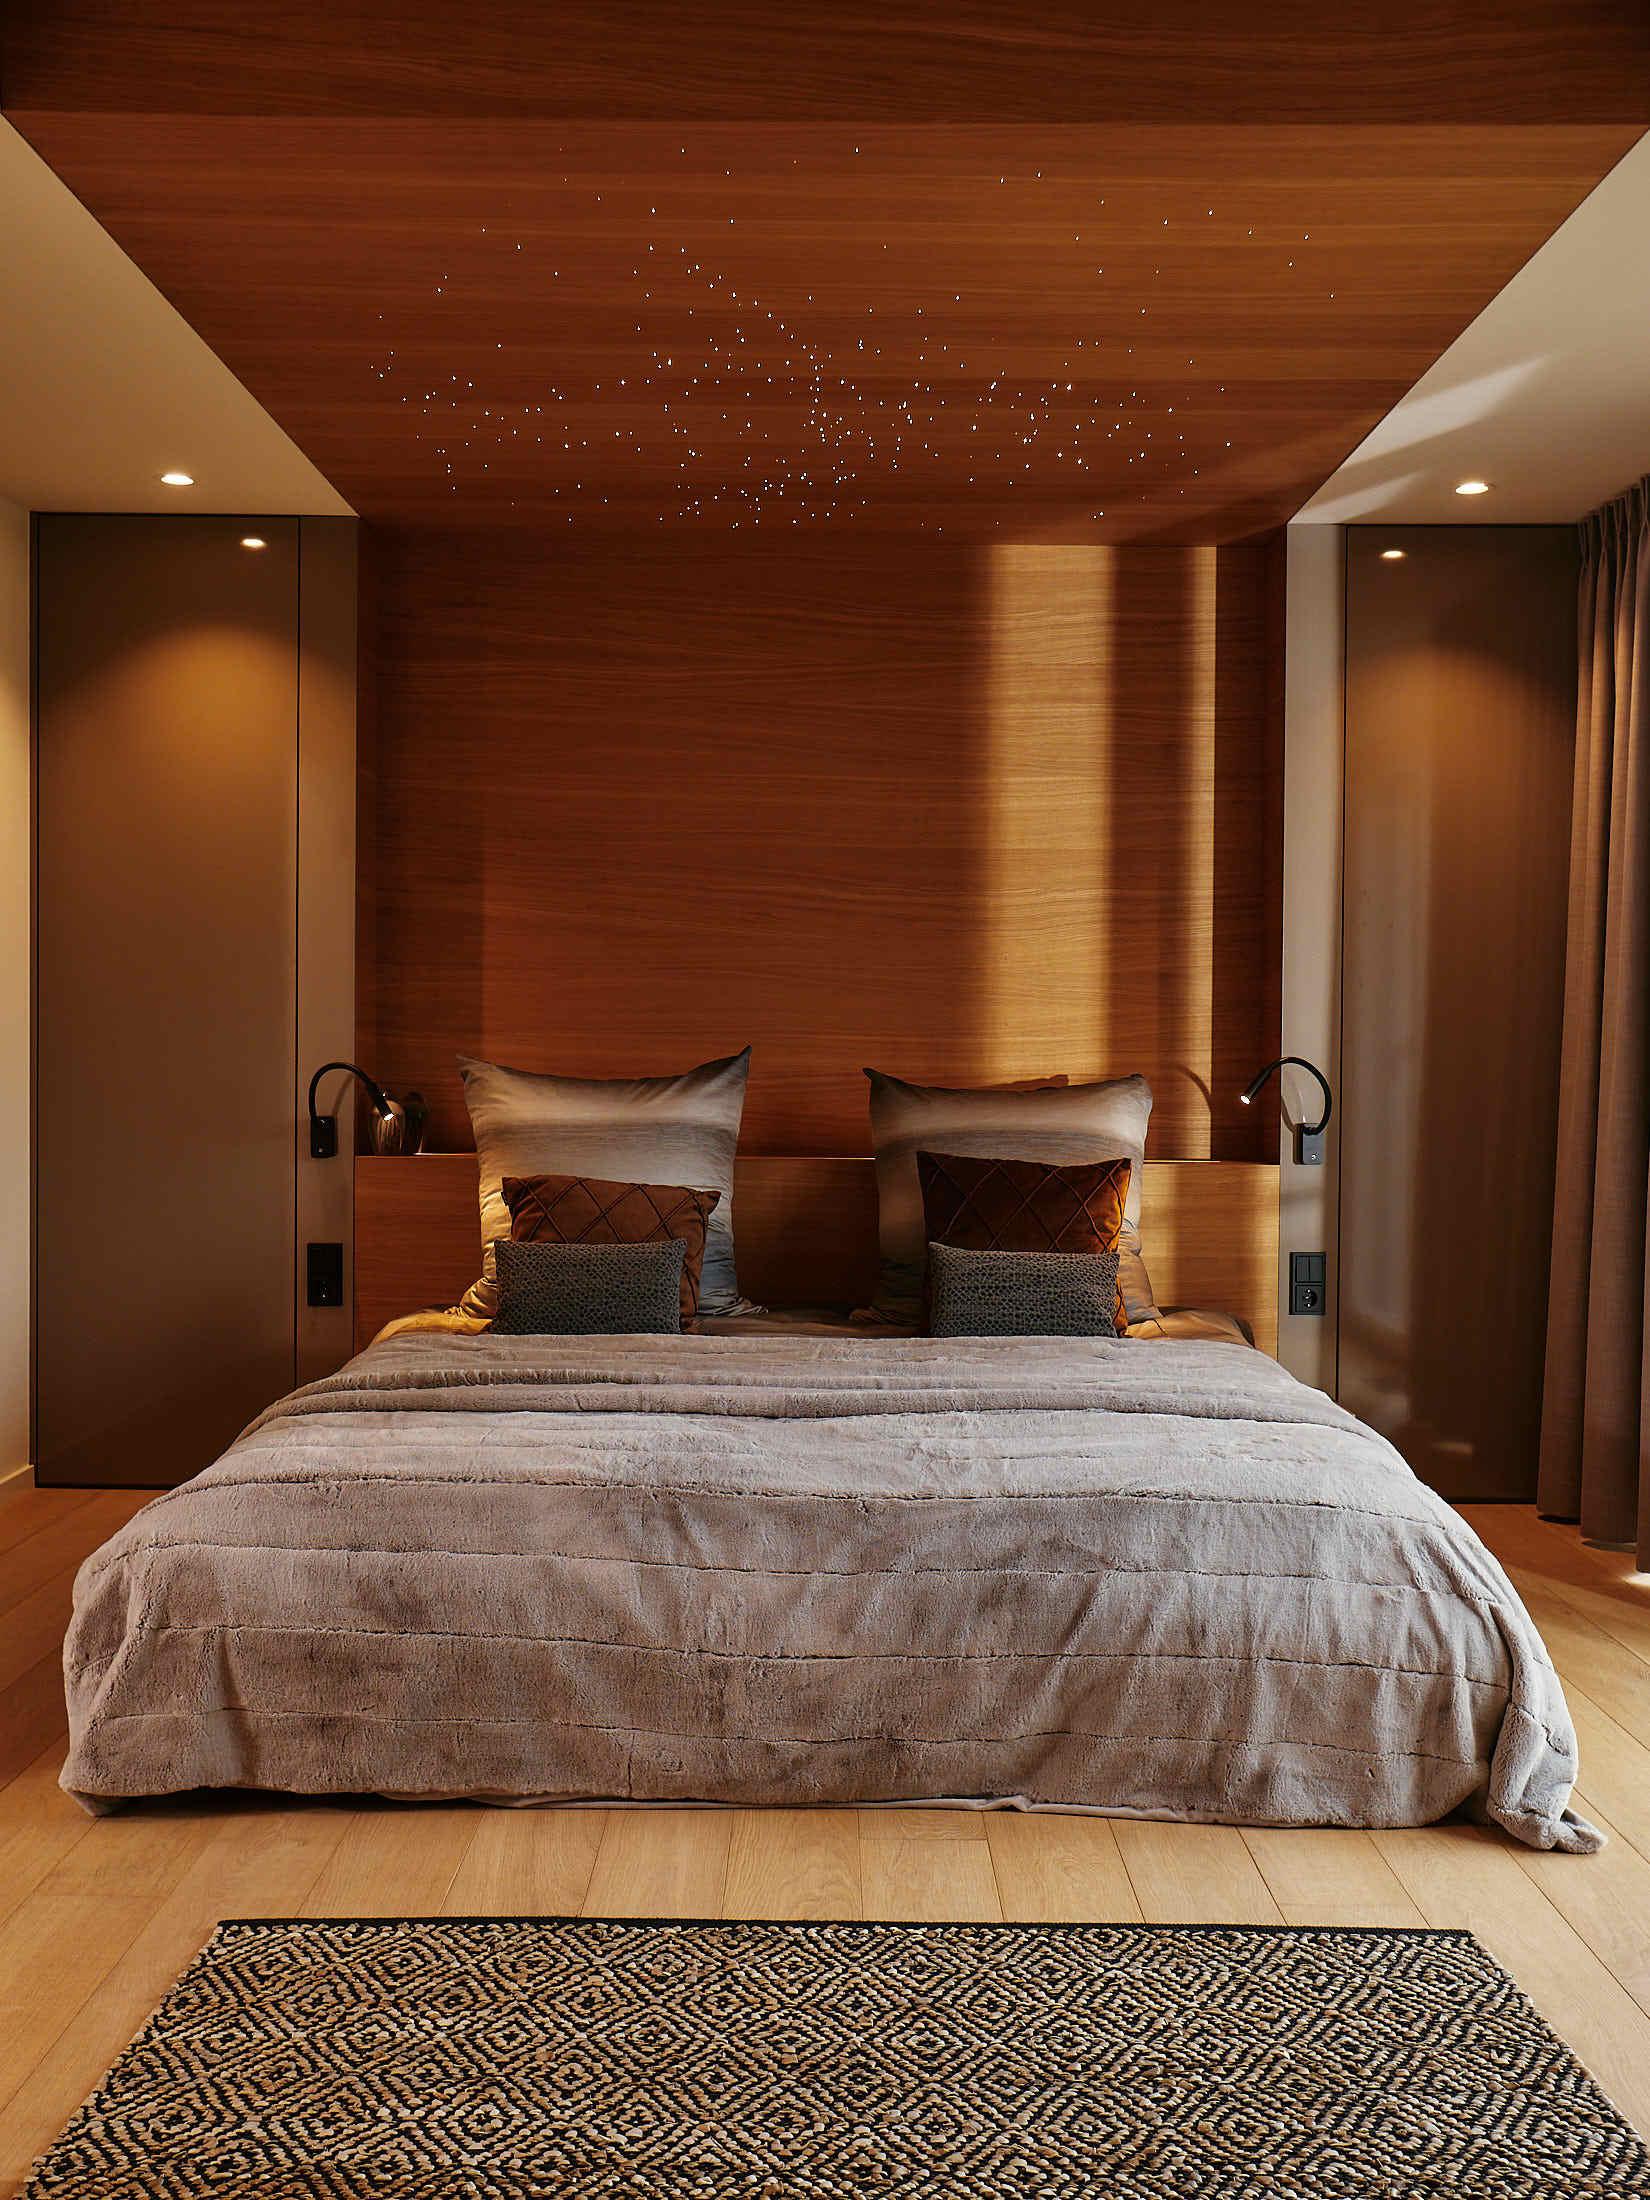 Bett mit Sternenhimmel Haustechnik